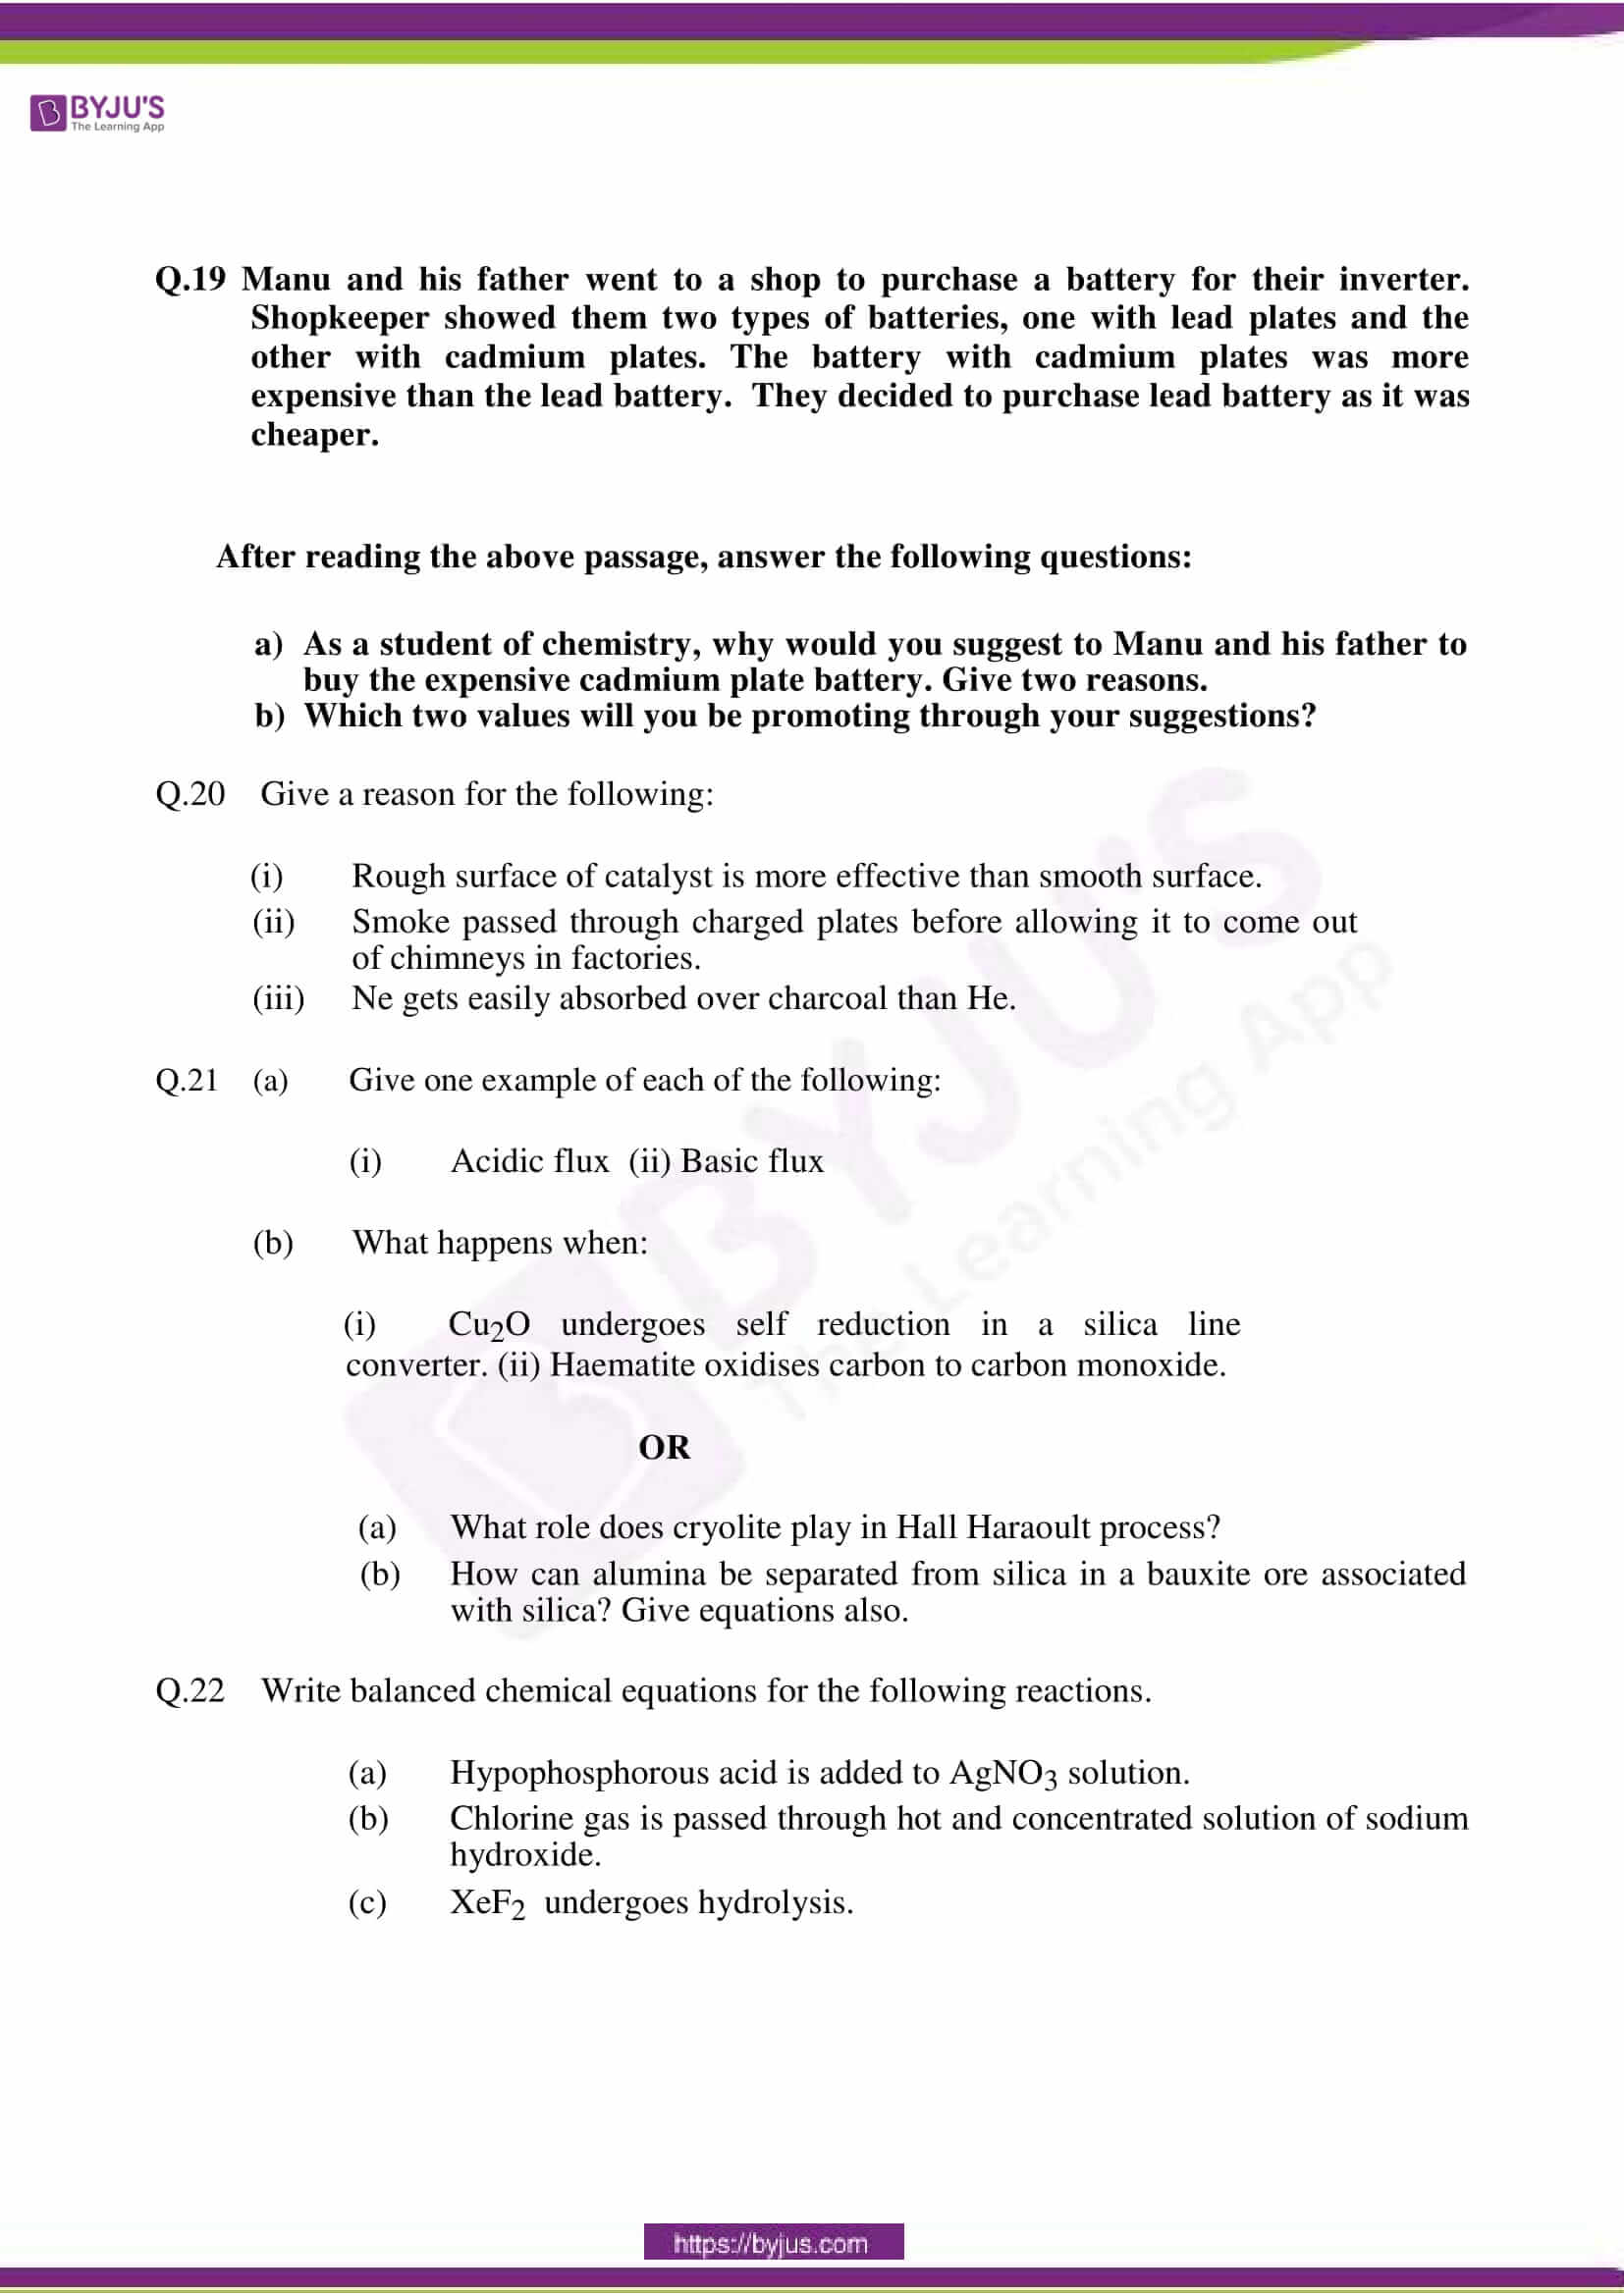 cbse sample paper class 12 chemistry set 8